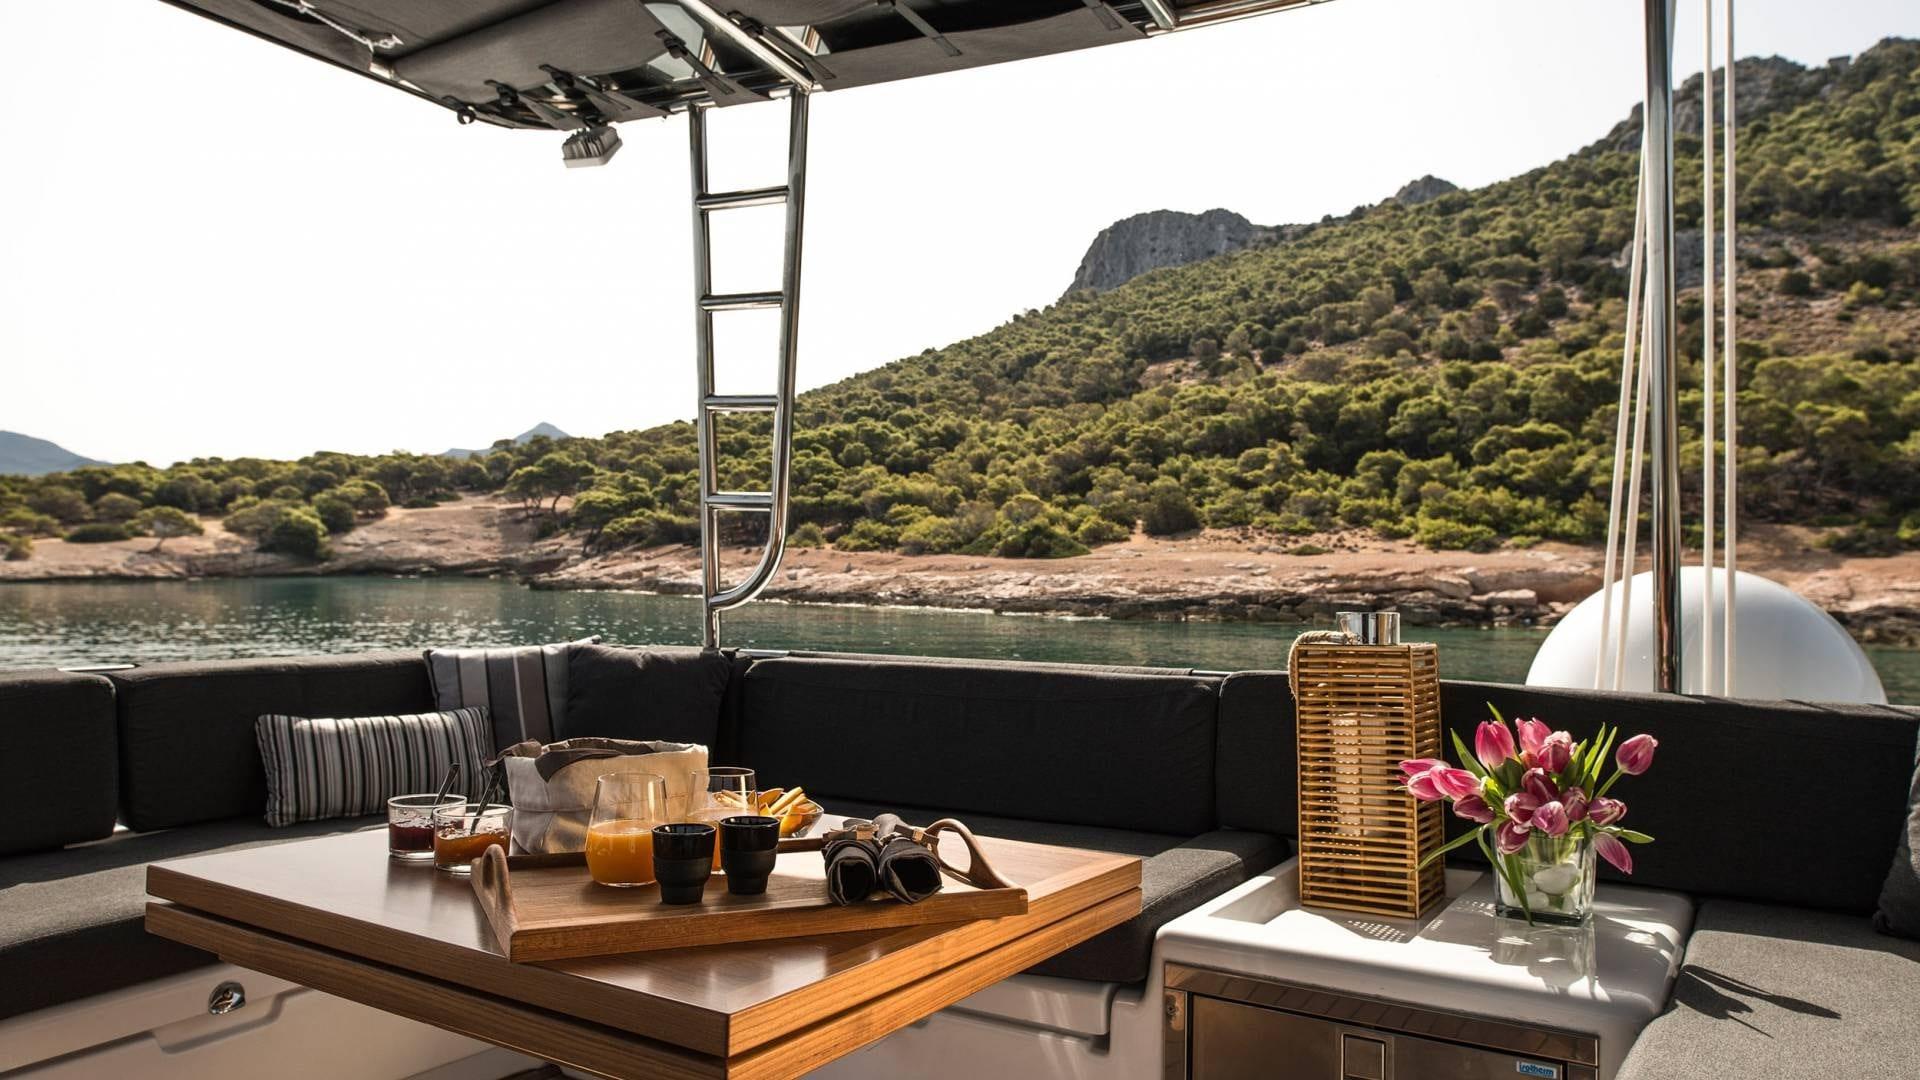 alyssa catamaran lagoon dining aboard (3) -  Valef Yachts Chartering - 2369